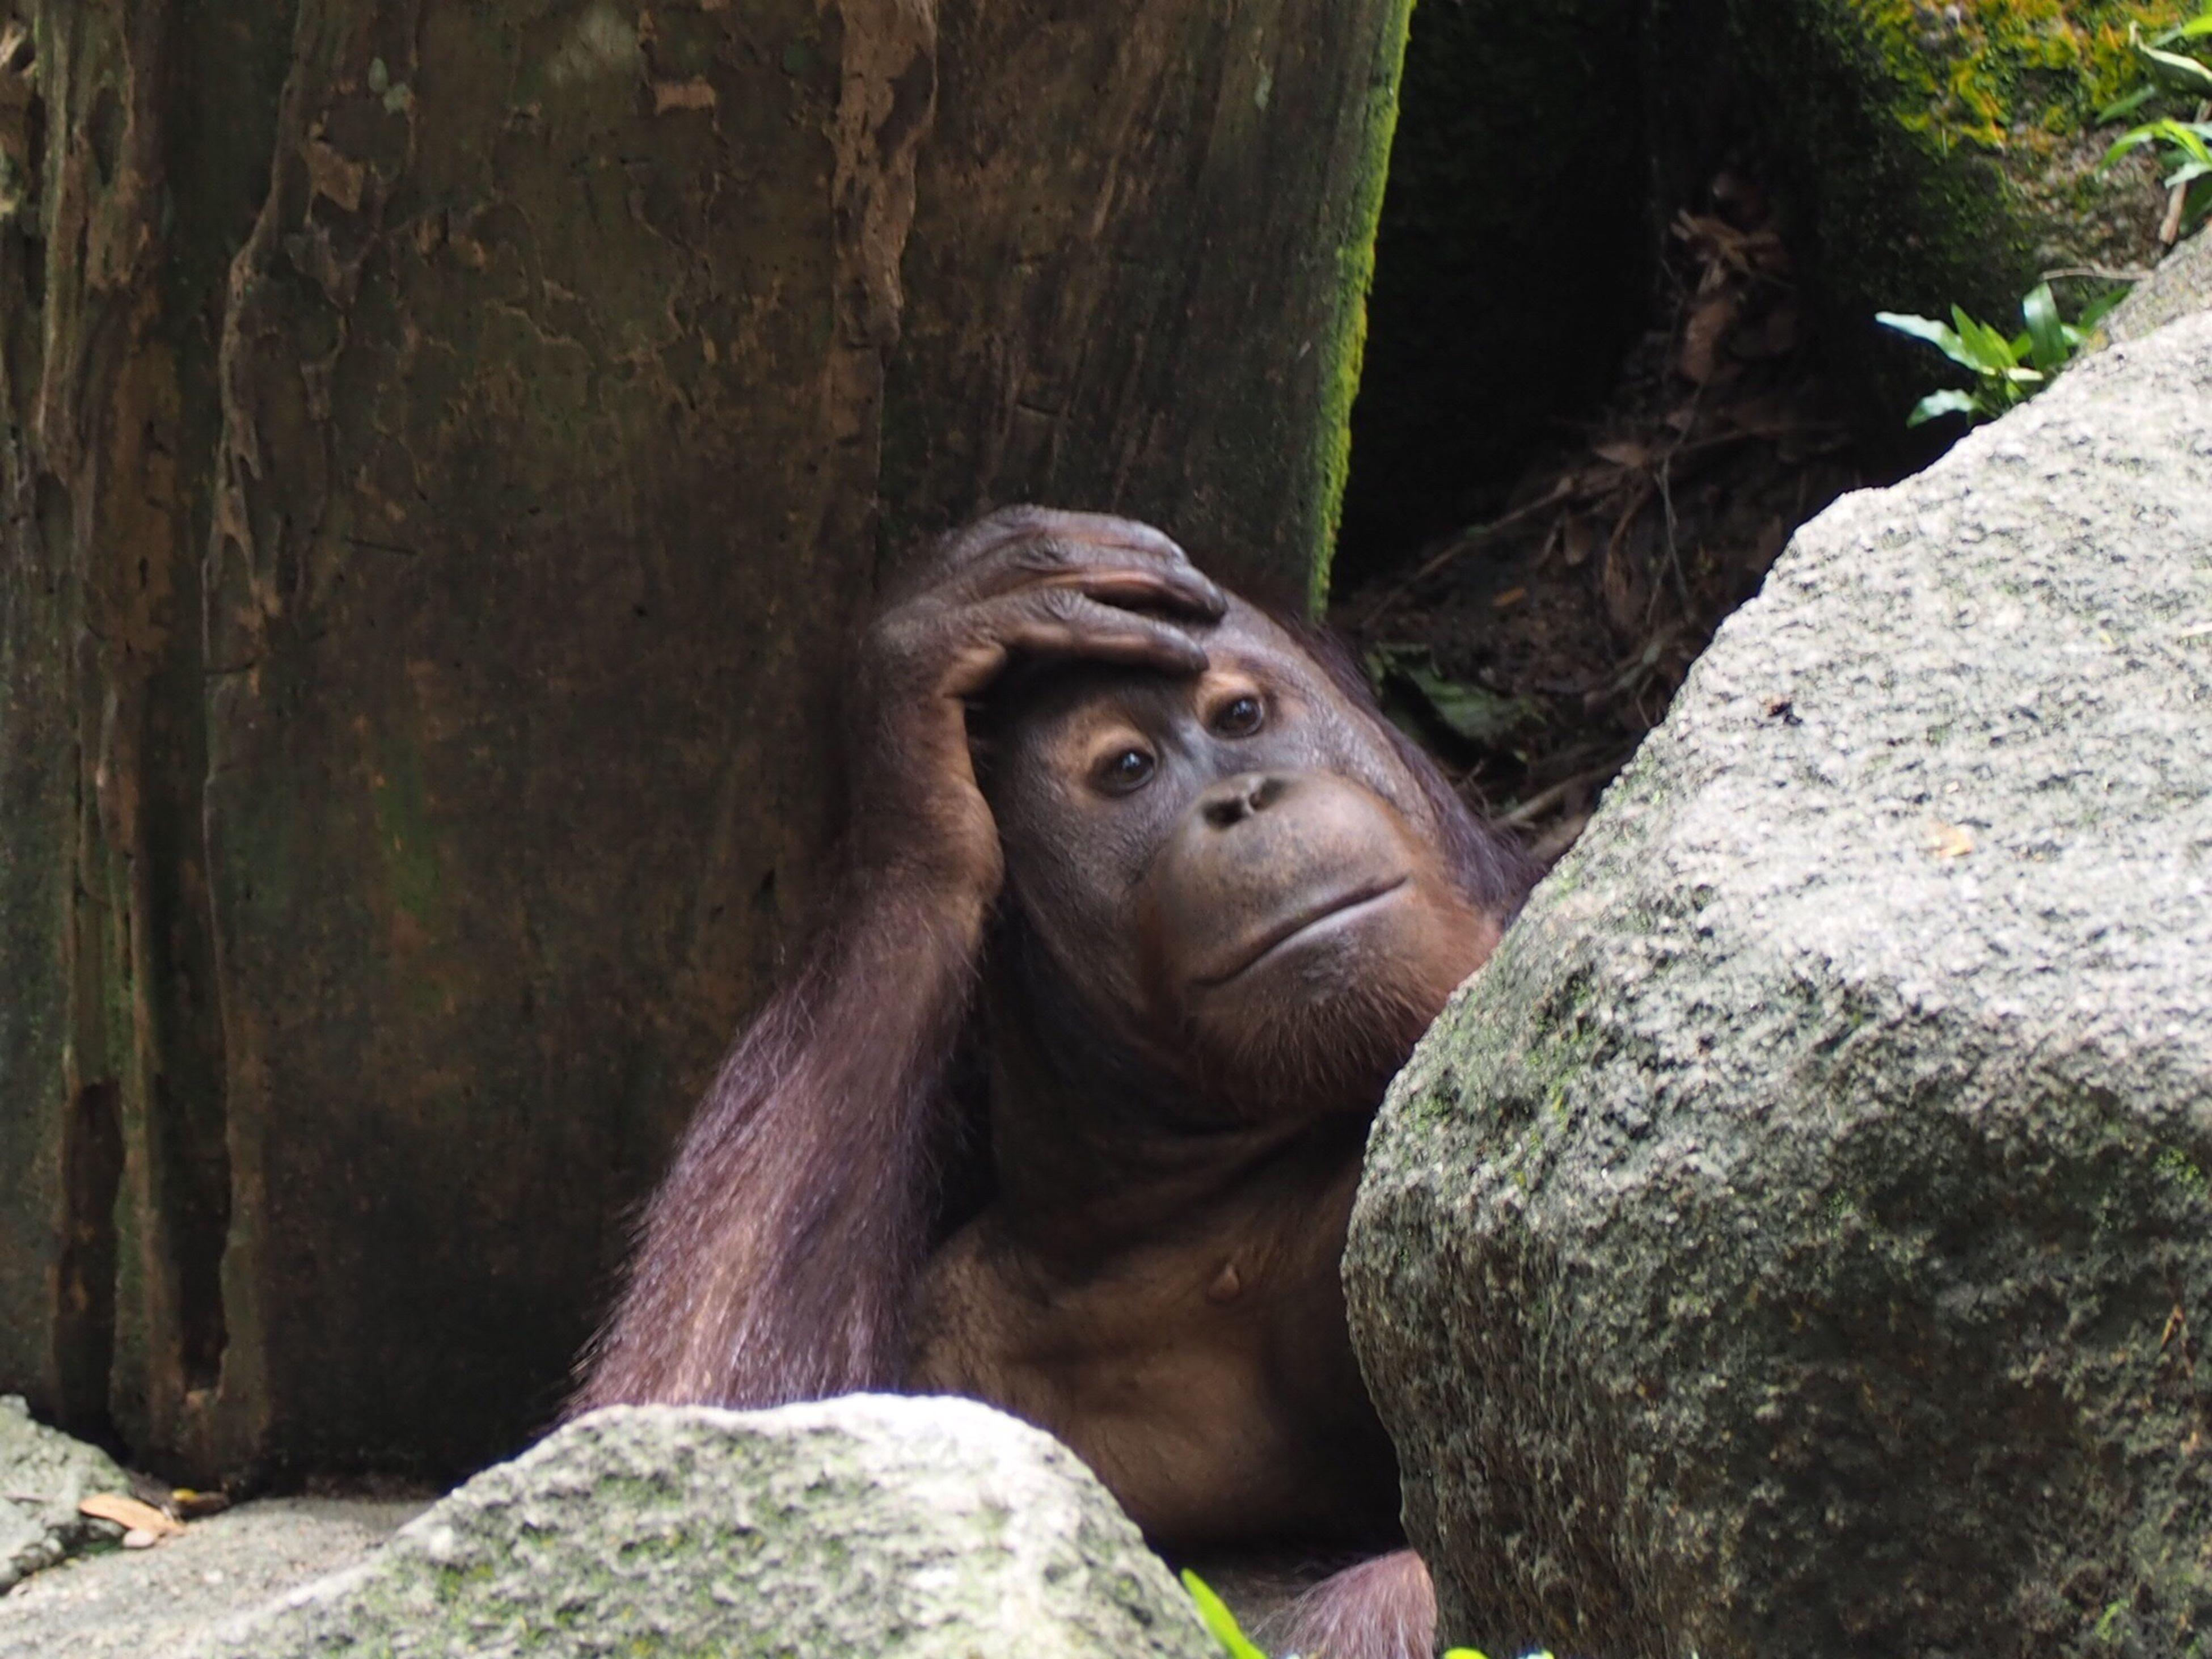 animal themes, animals in the wild, one animal, animal wildlife, no people, orangutan, primate, nature, mammal, outdoors, close-up, day, gorilla, tree, monkey, chimpanzee